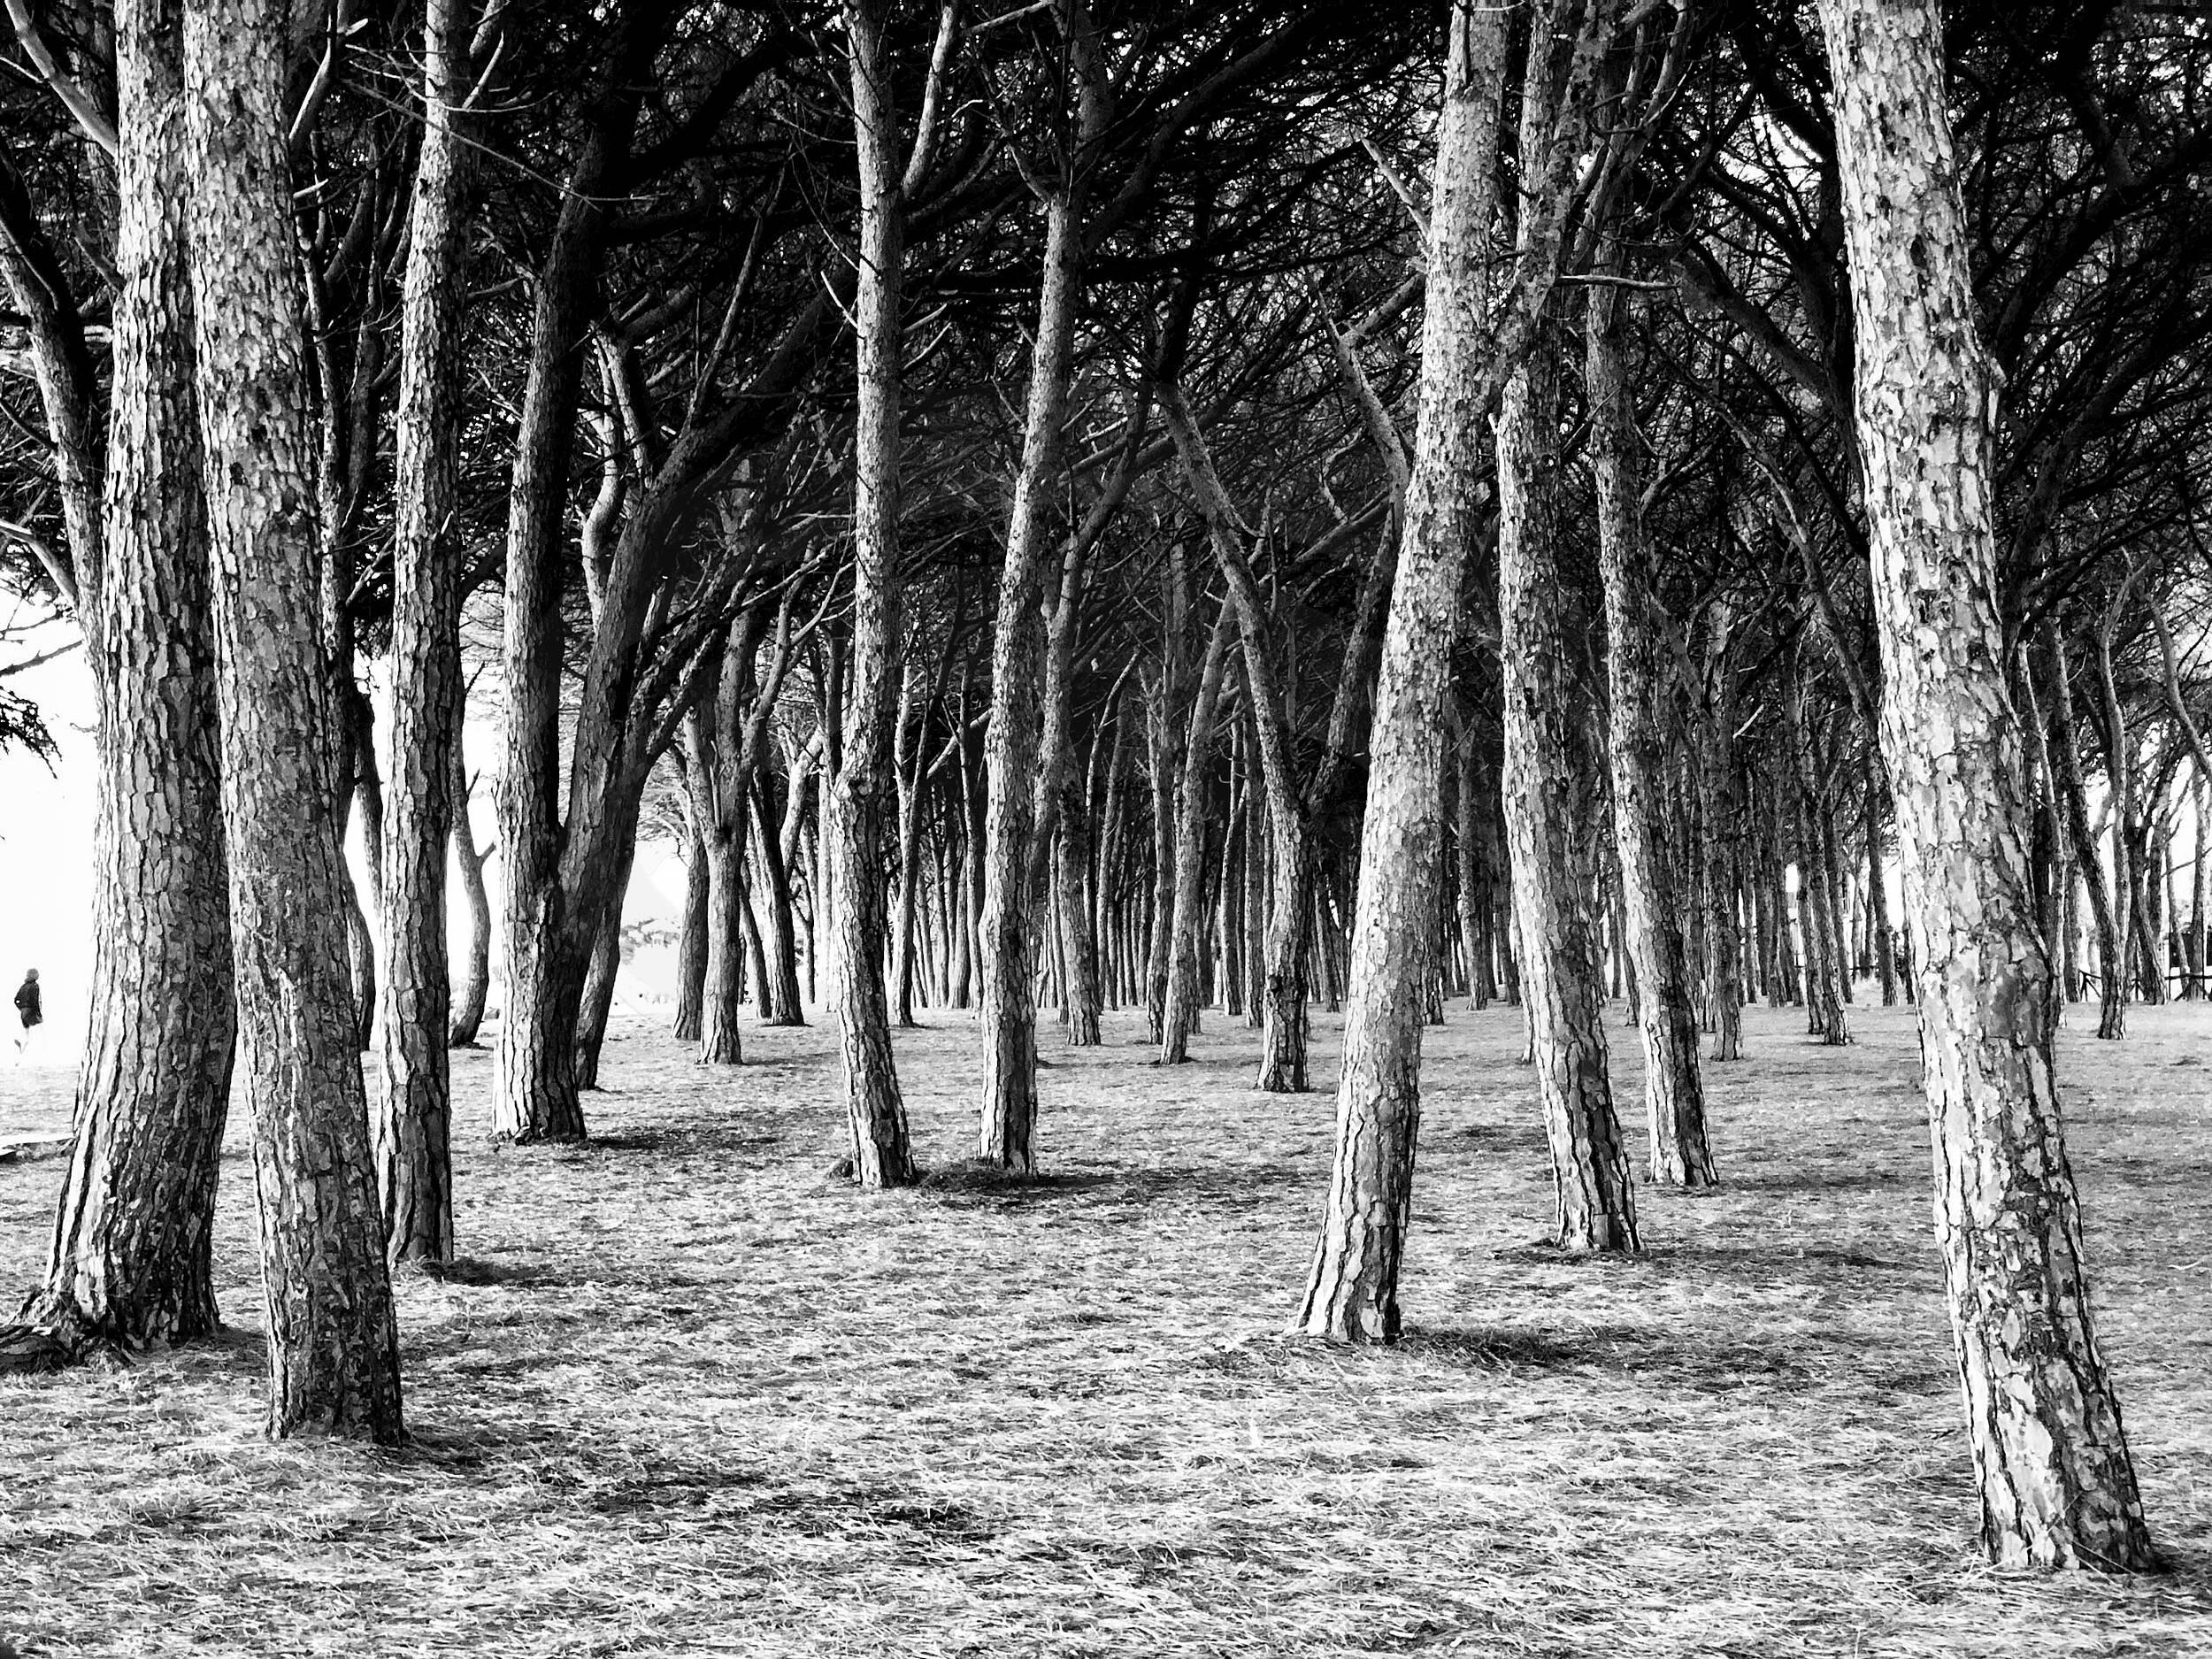 Bäume im Schatten